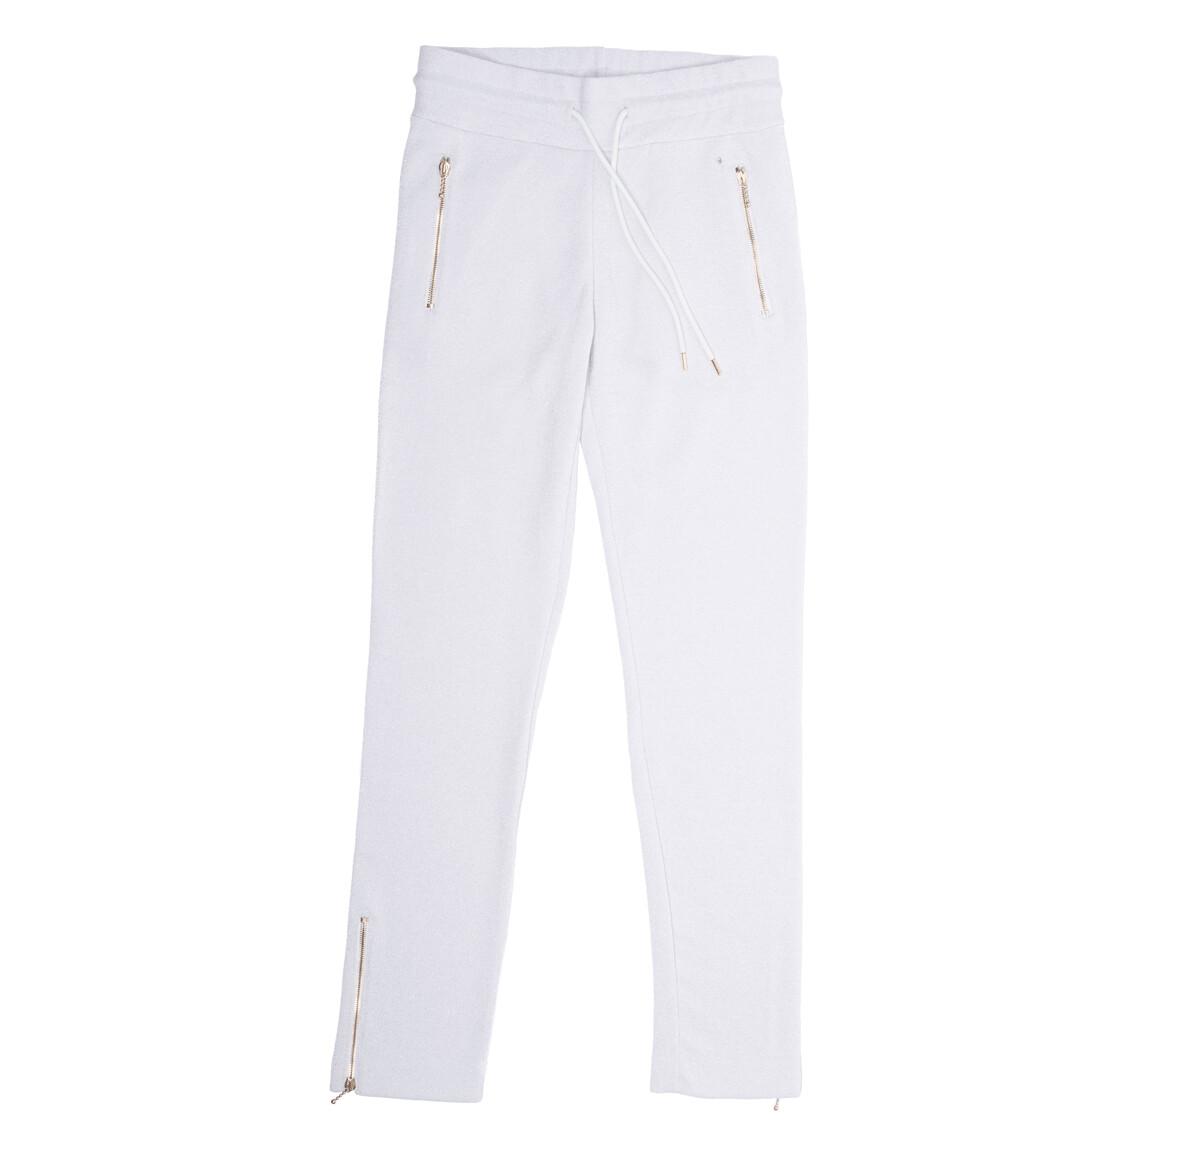 BRIGHT WHITE (Trouser)